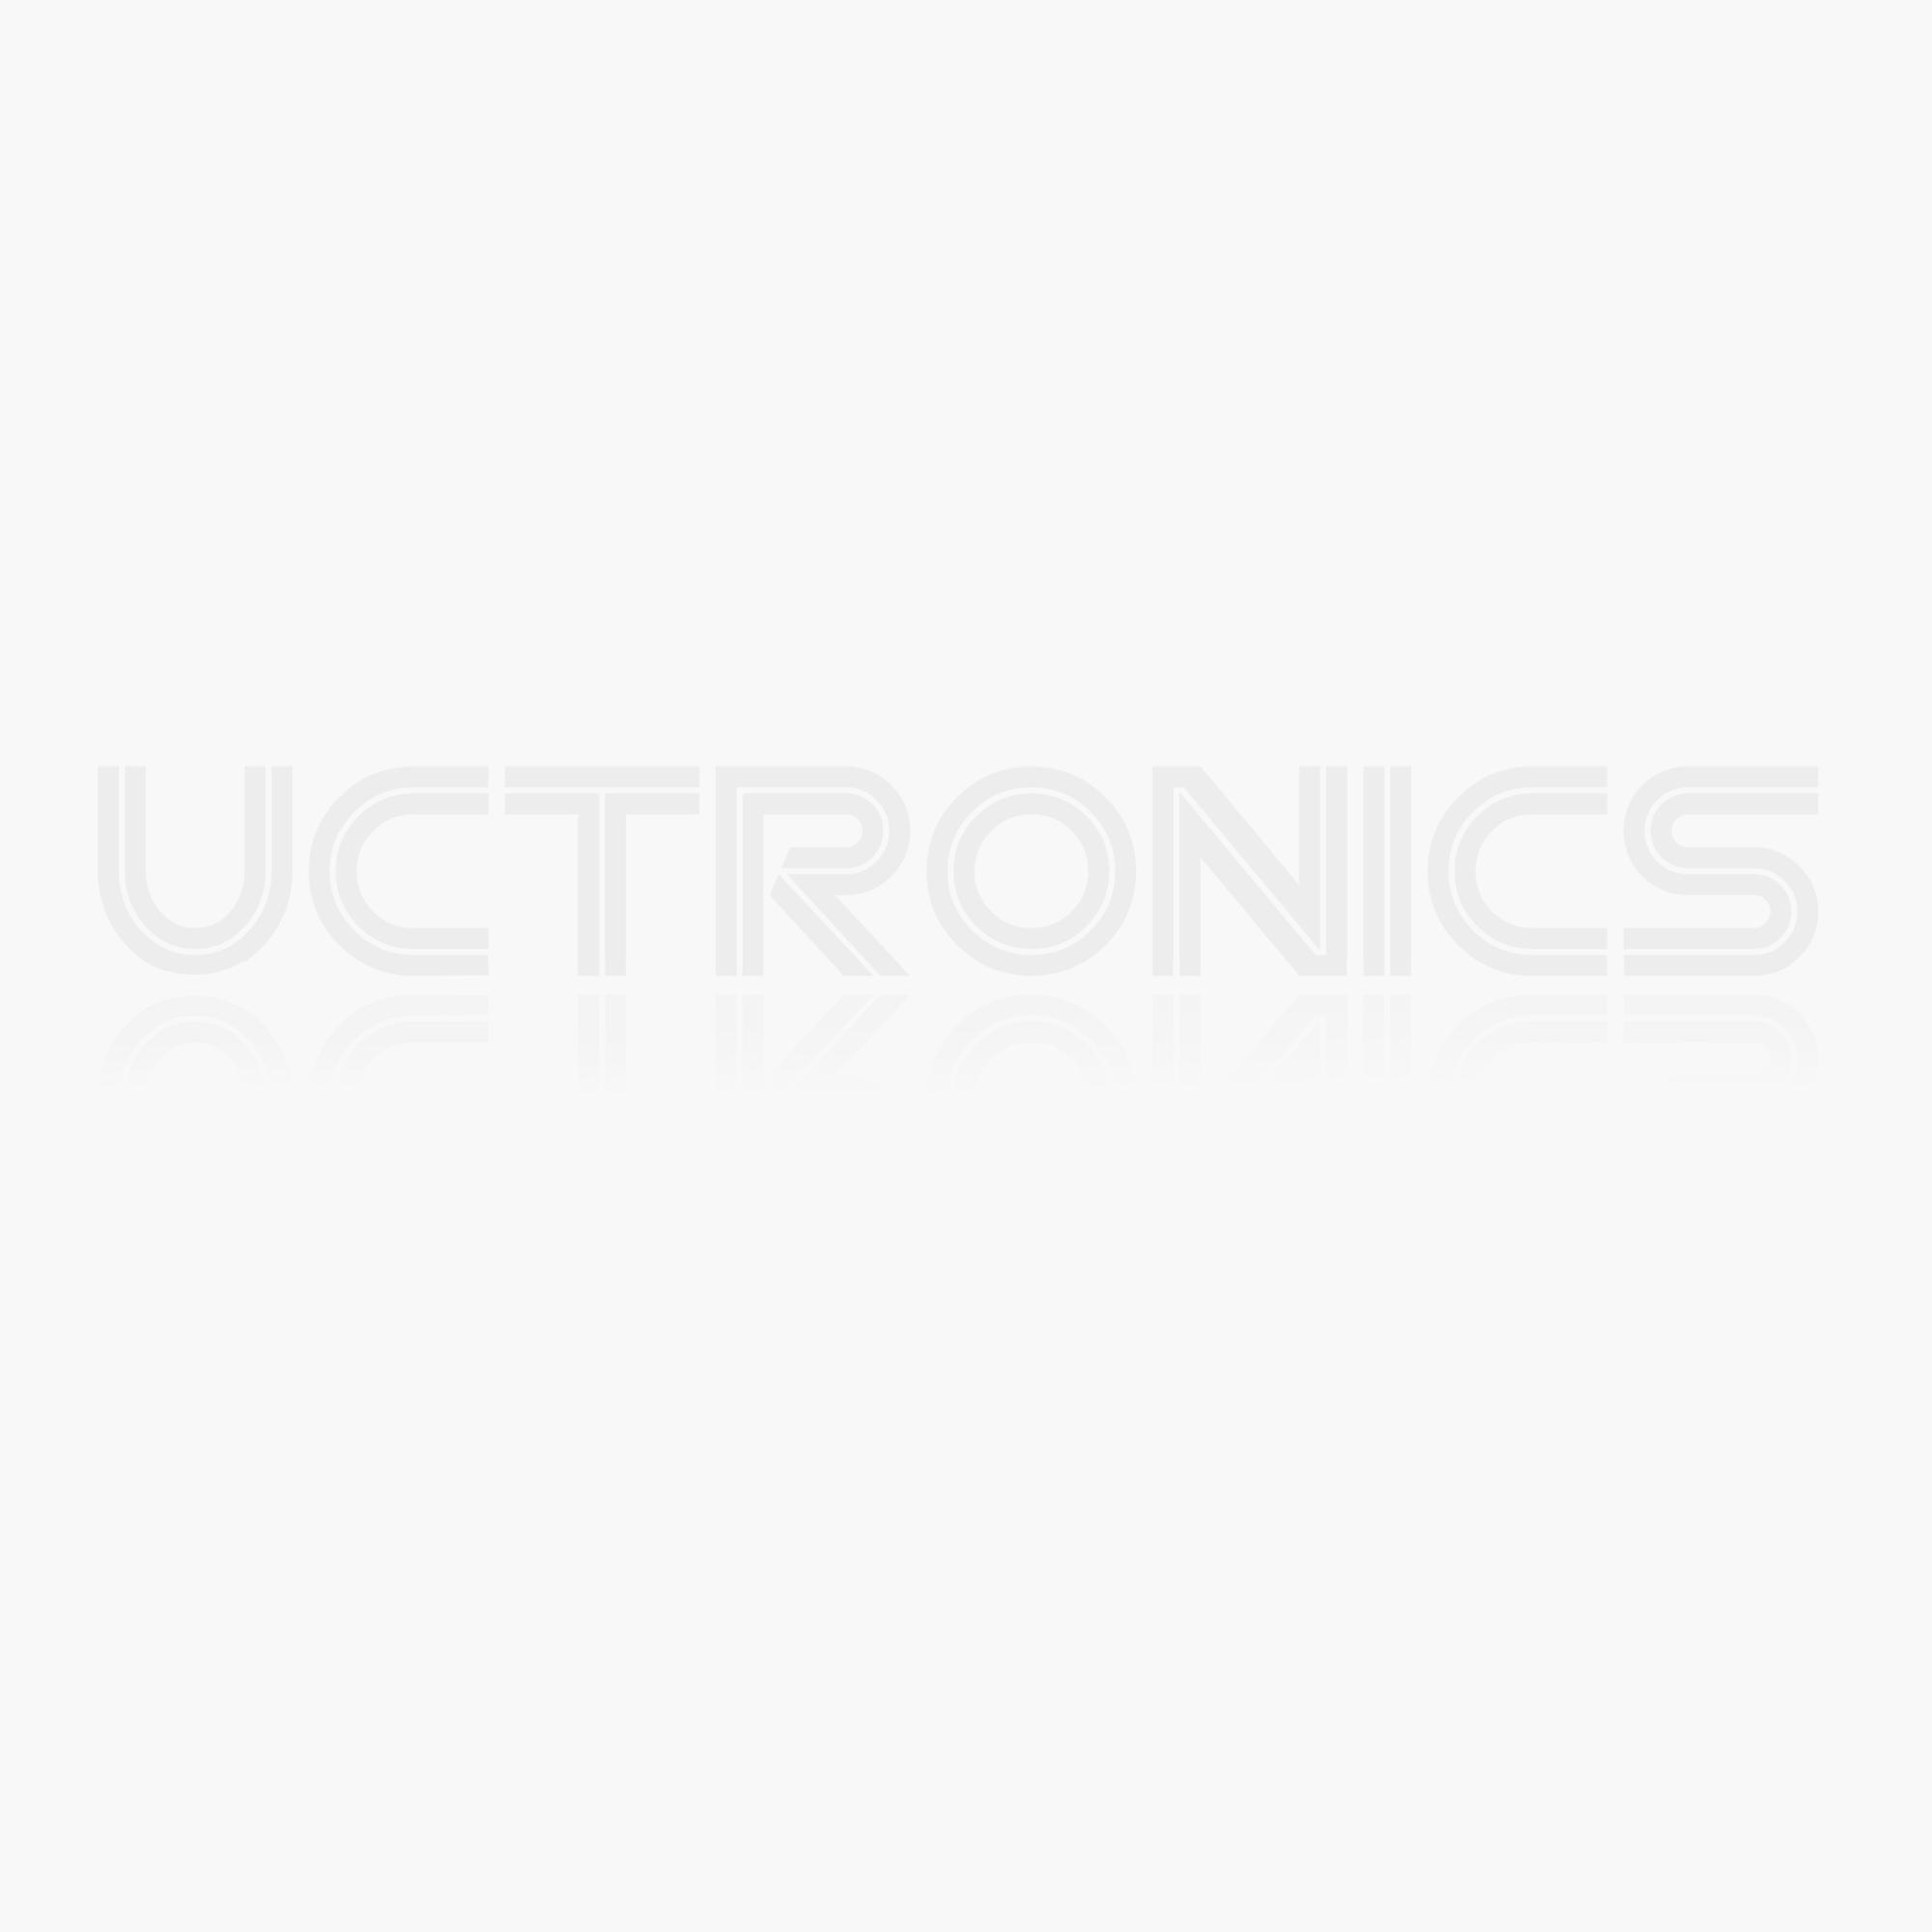 35V 2A Driver v1.2 Stepper Motor Drive Module for Arduino